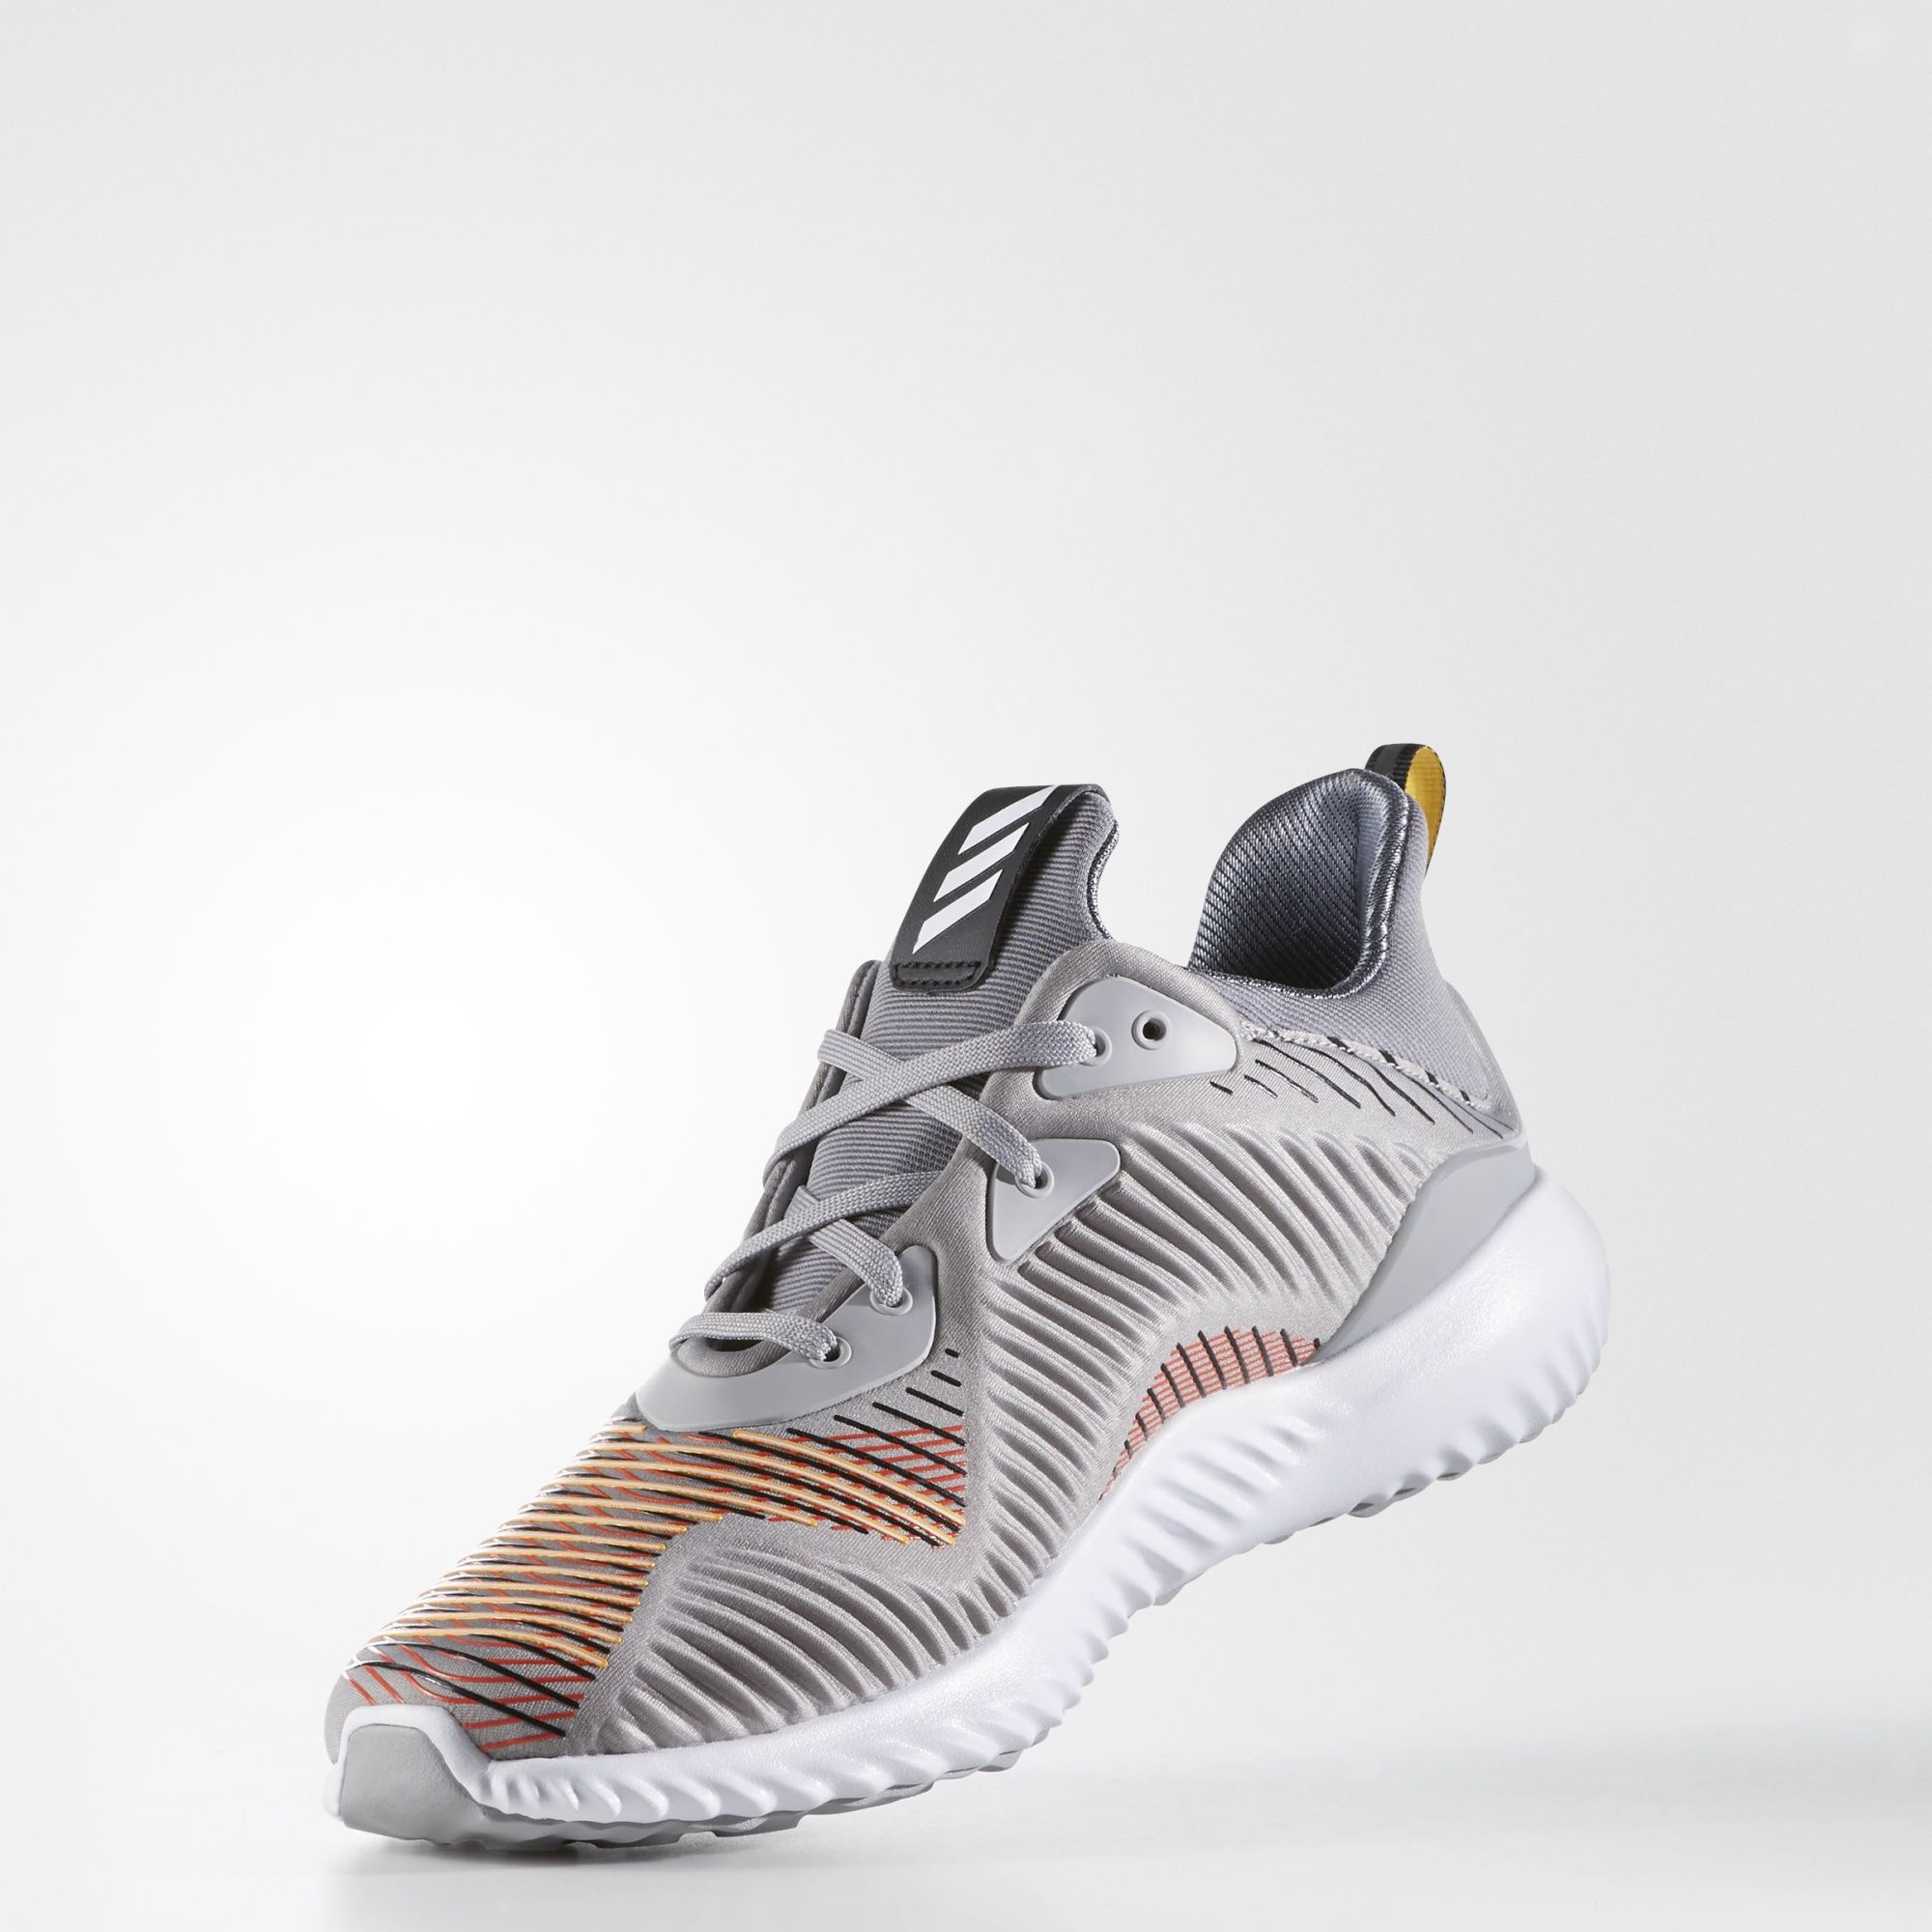 hot sale online ecbad 3d751 adidas alphabounce HPC Running Shoes - SPORT SHOES RUNNING SHOES -  Superfanas.lt